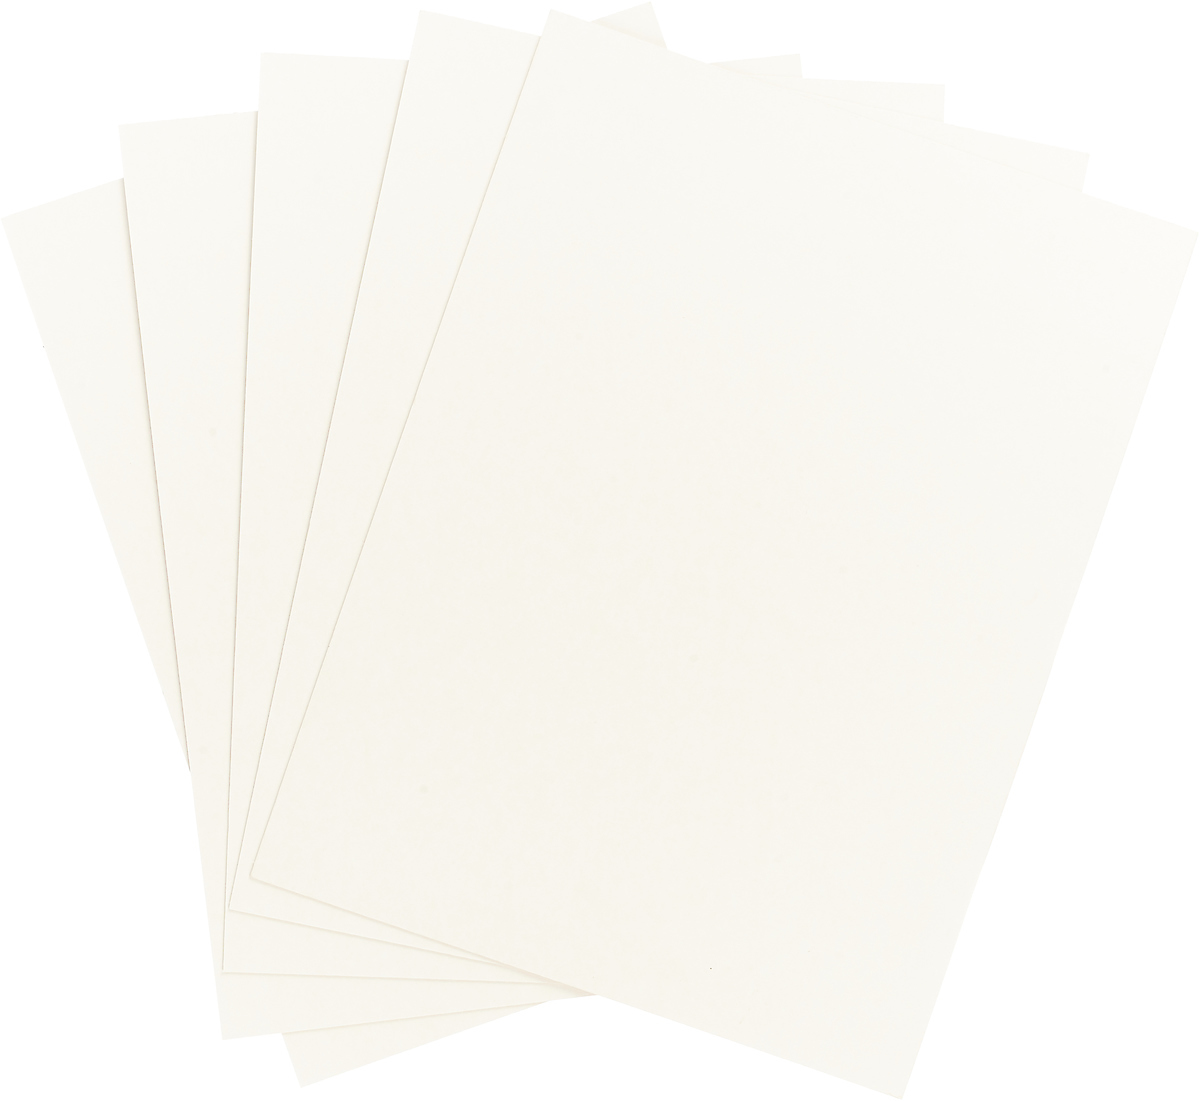 Пивной картон Decoriton, 30 х 40 см, 5 шт стикер paristic шарик 20 х 30 см